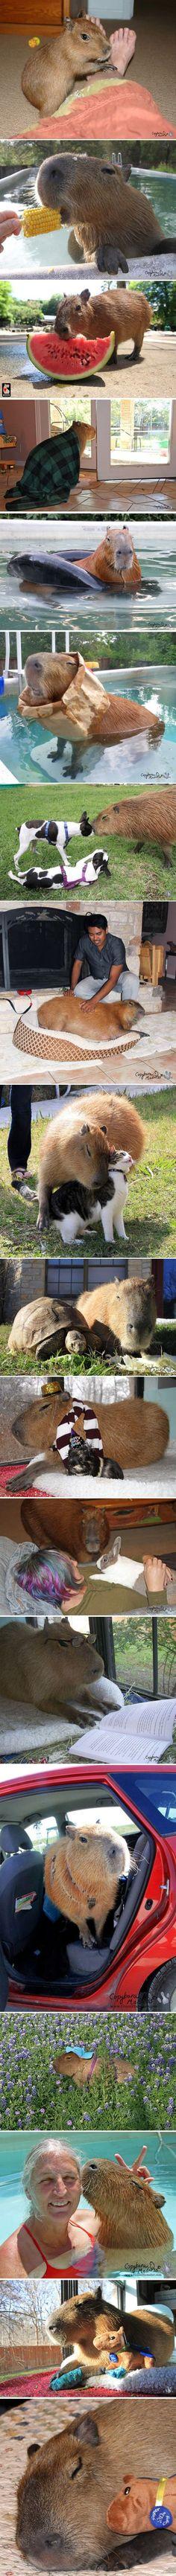 The Internet needs more capybaras…